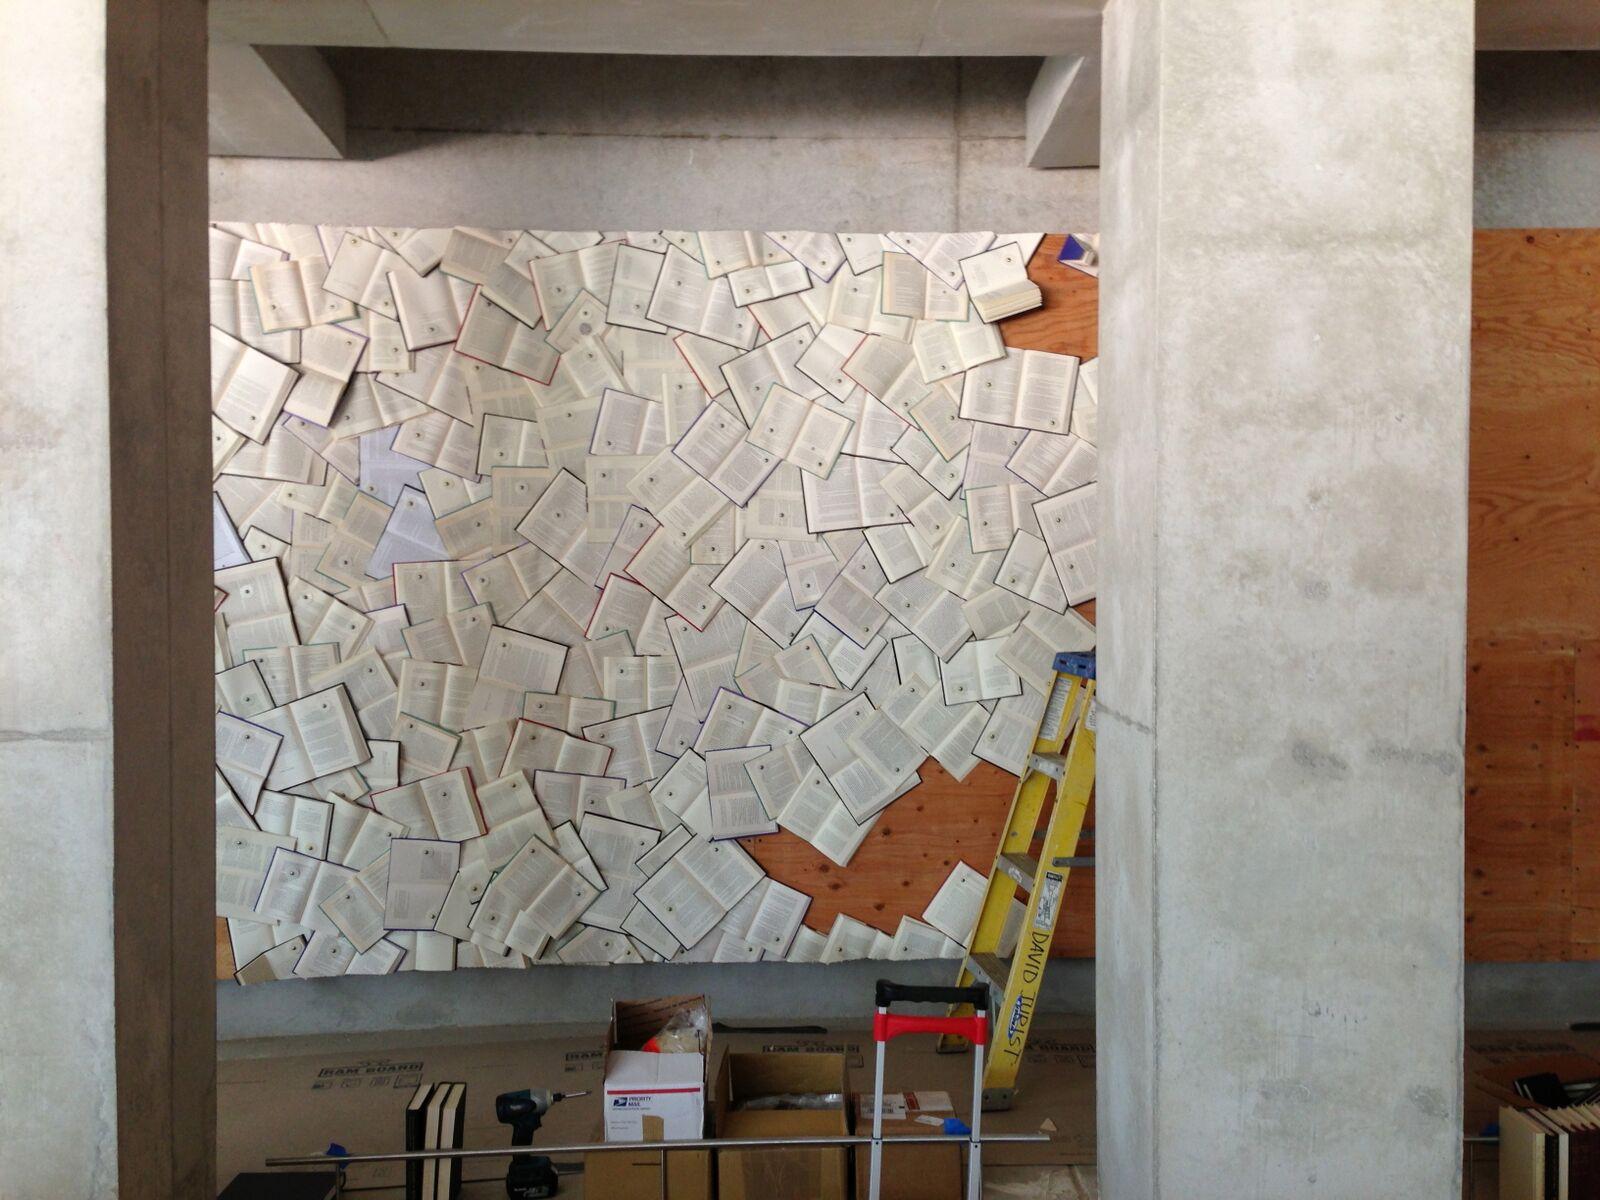 San Diego_Hiding My Candy _Donald Lipski_Public Art Services_J Grant Projects_7.jpeg